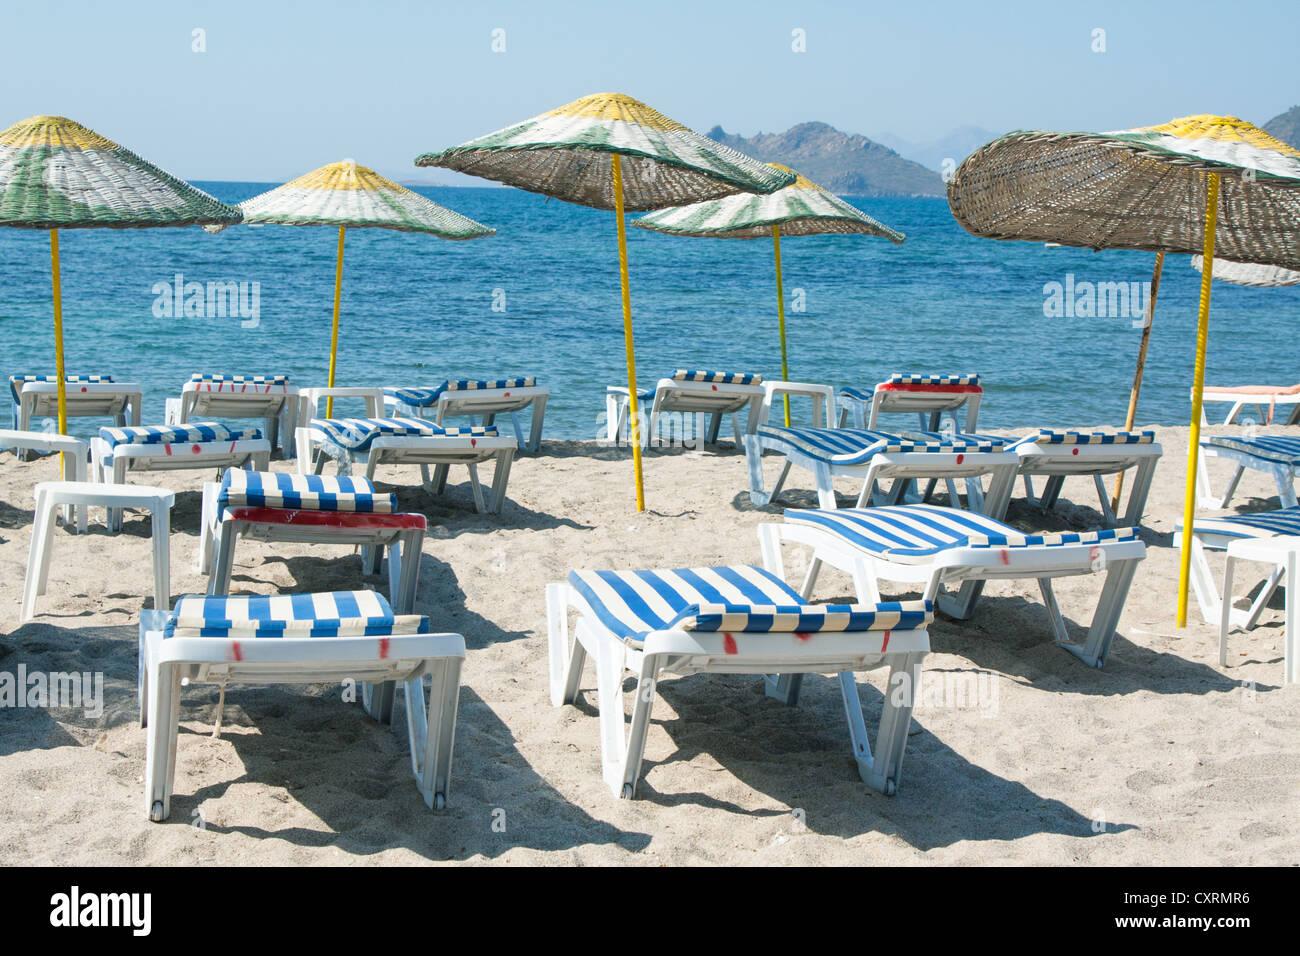 Sun loungers and wicker umbrellas on sandy beach Stock Photo